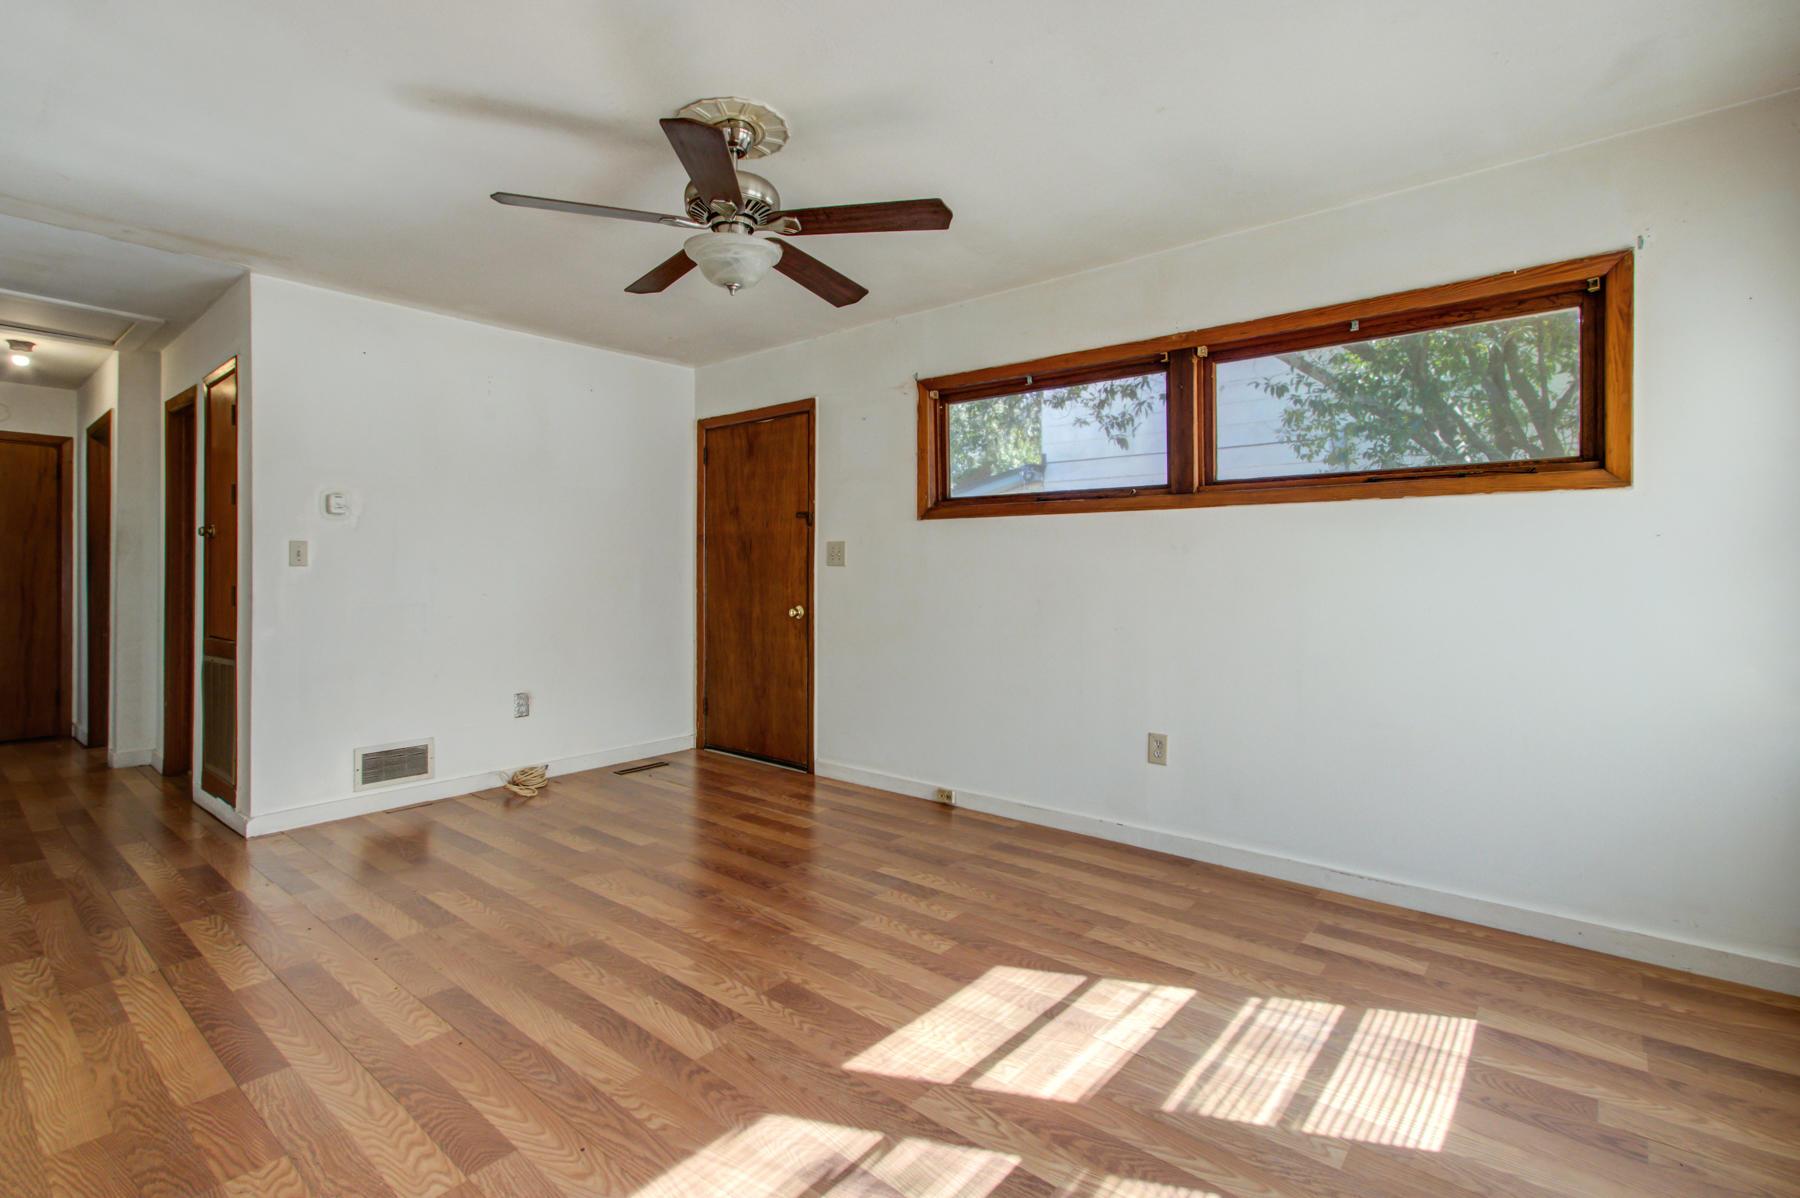 Port Park Homes For Sale - 5814 Moore, Hanahan, SC - 20